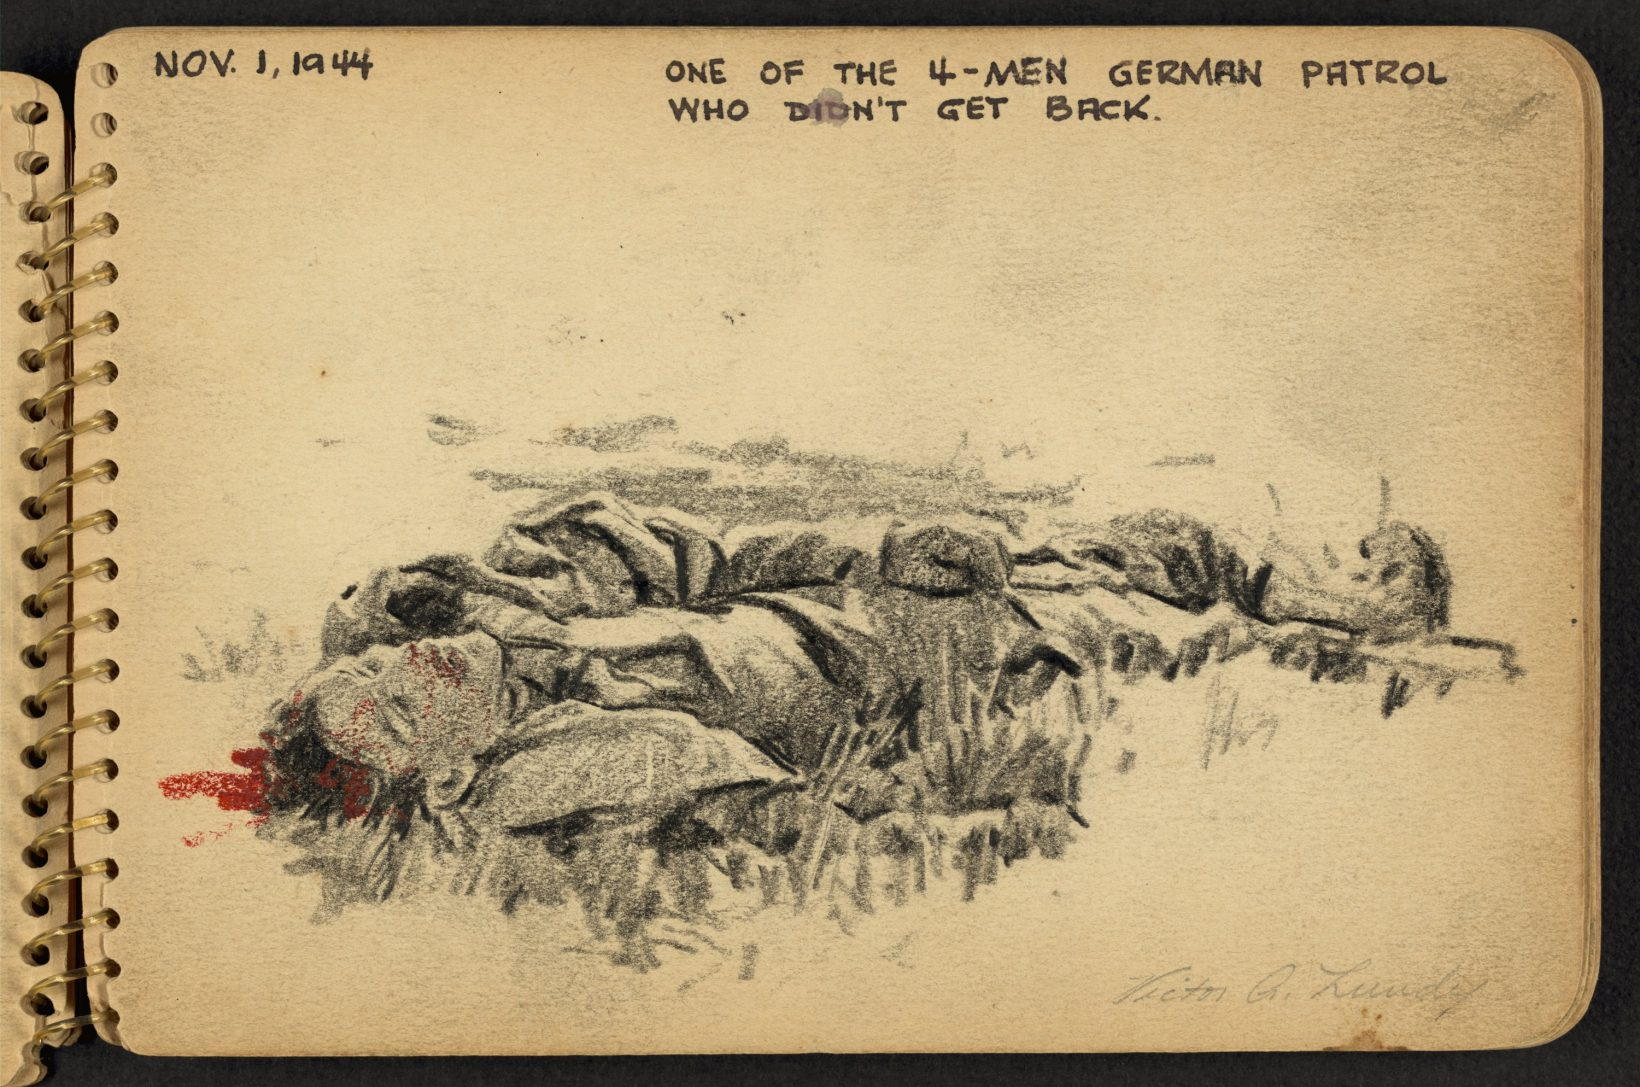 victor-lundy-carnet-croquis-seconde-guerre-mondiale-63-1640x1087.jpg